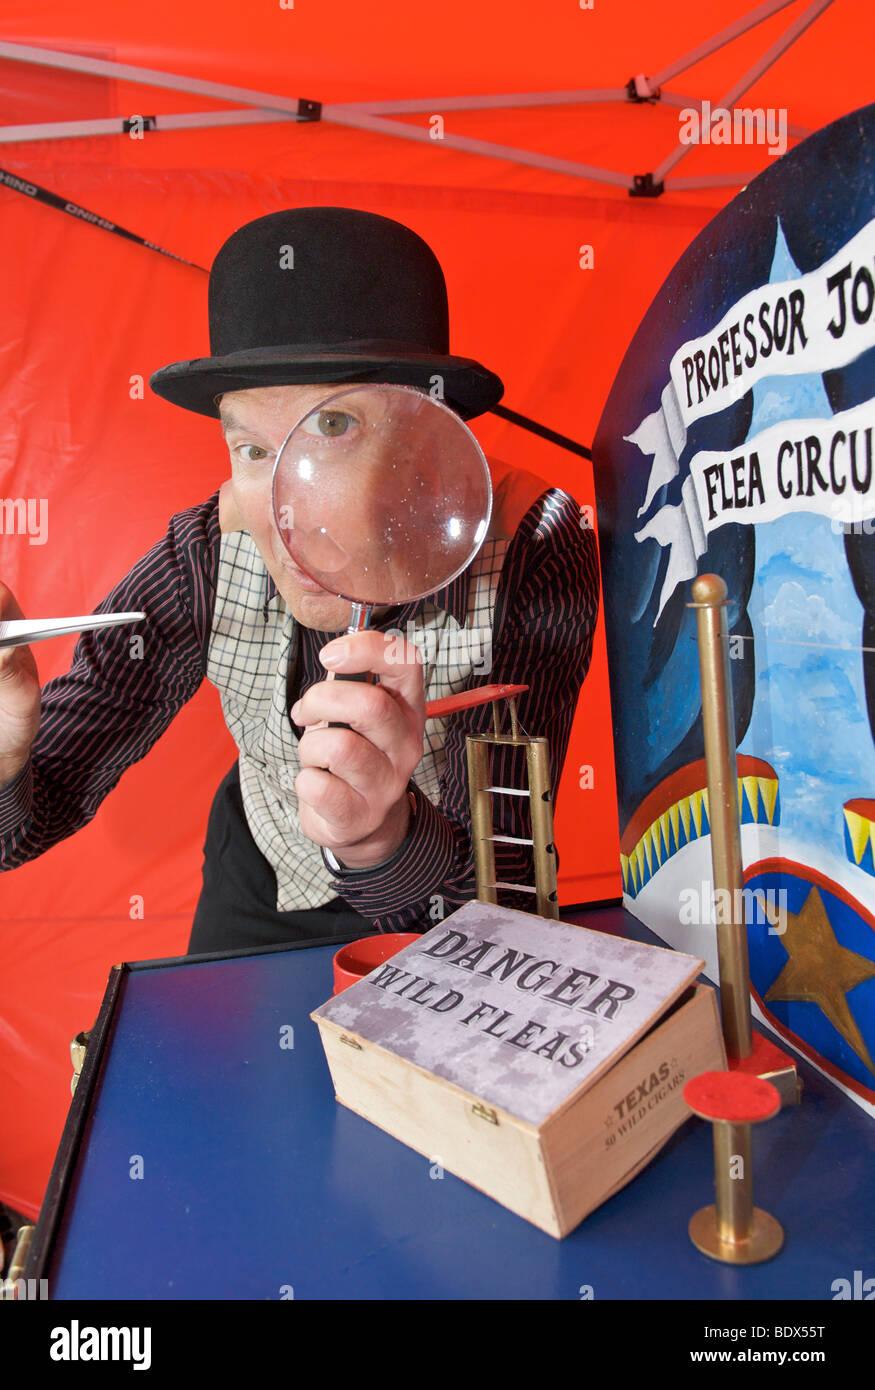 Professor Jon's flea circus - Stock Image